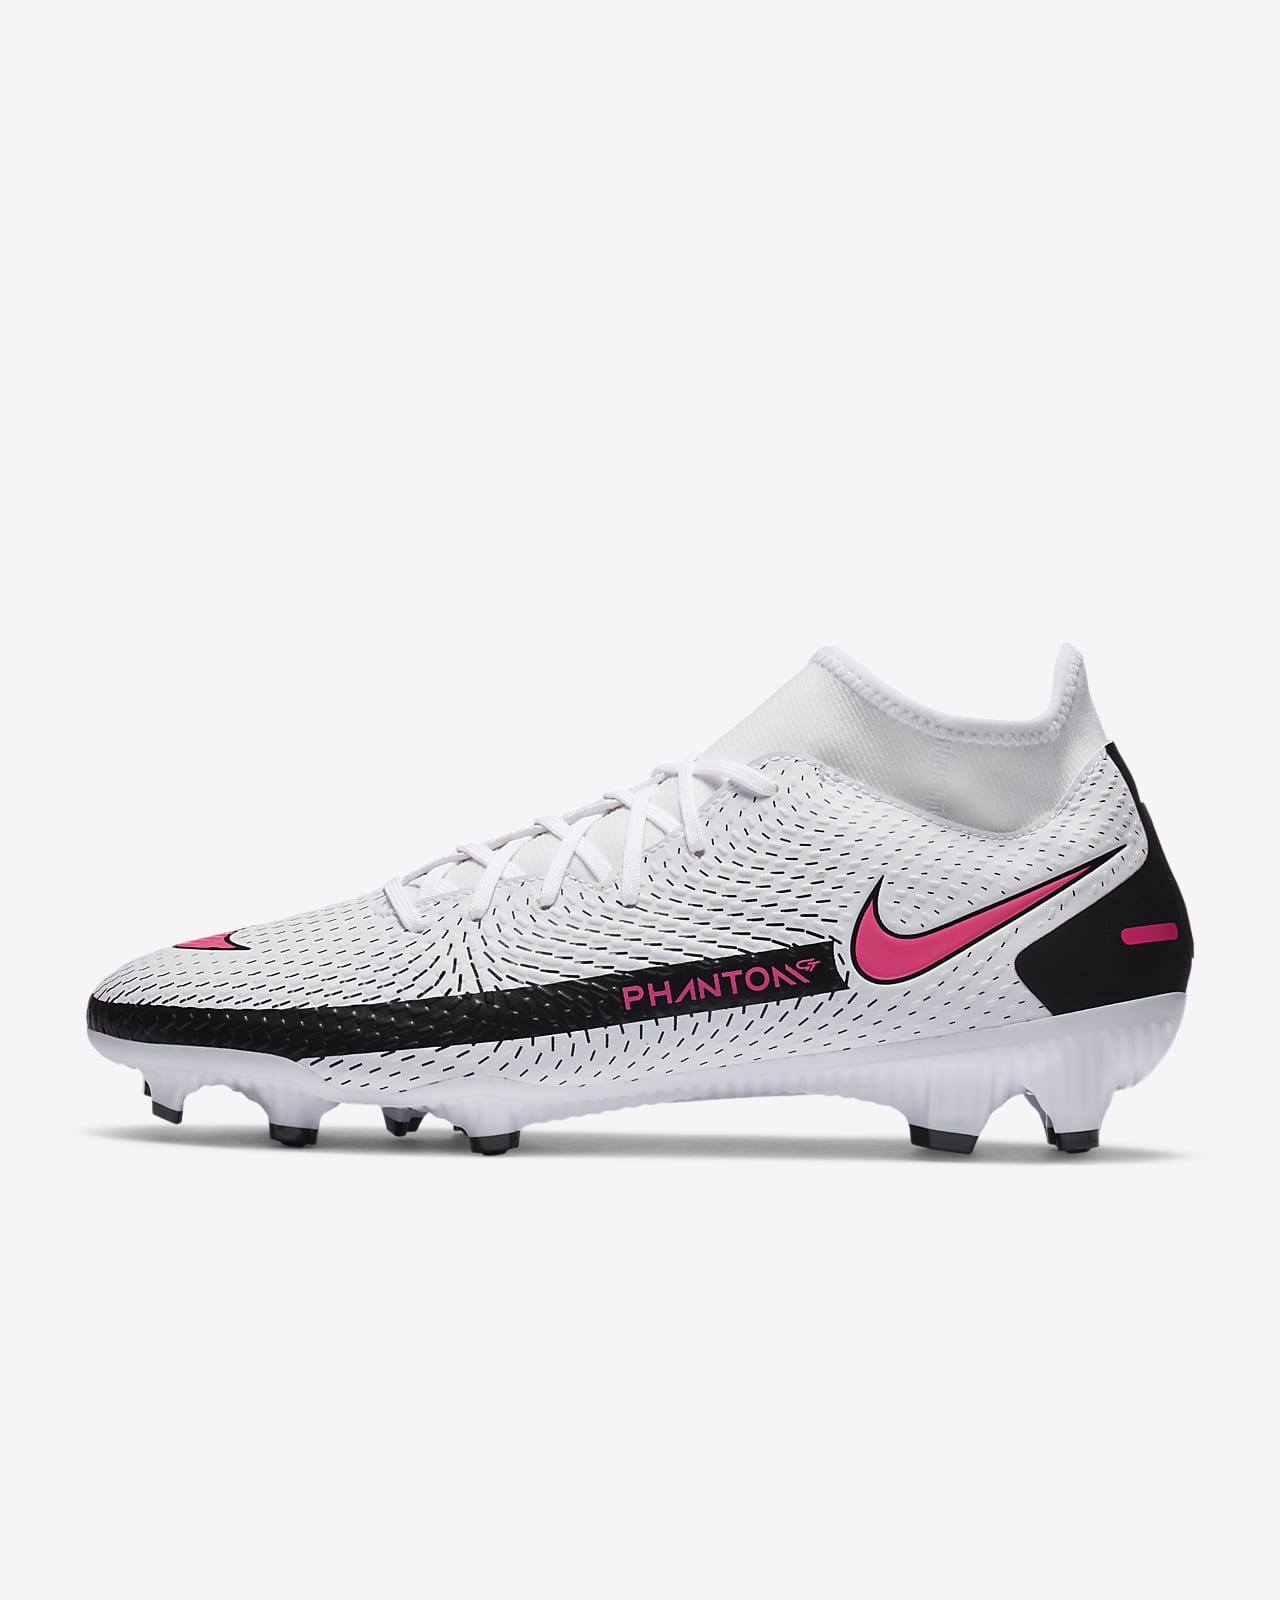 Chaussure de football multi-surfaces à crampons Nike Phantom GT Academy Dynamic Fit MG